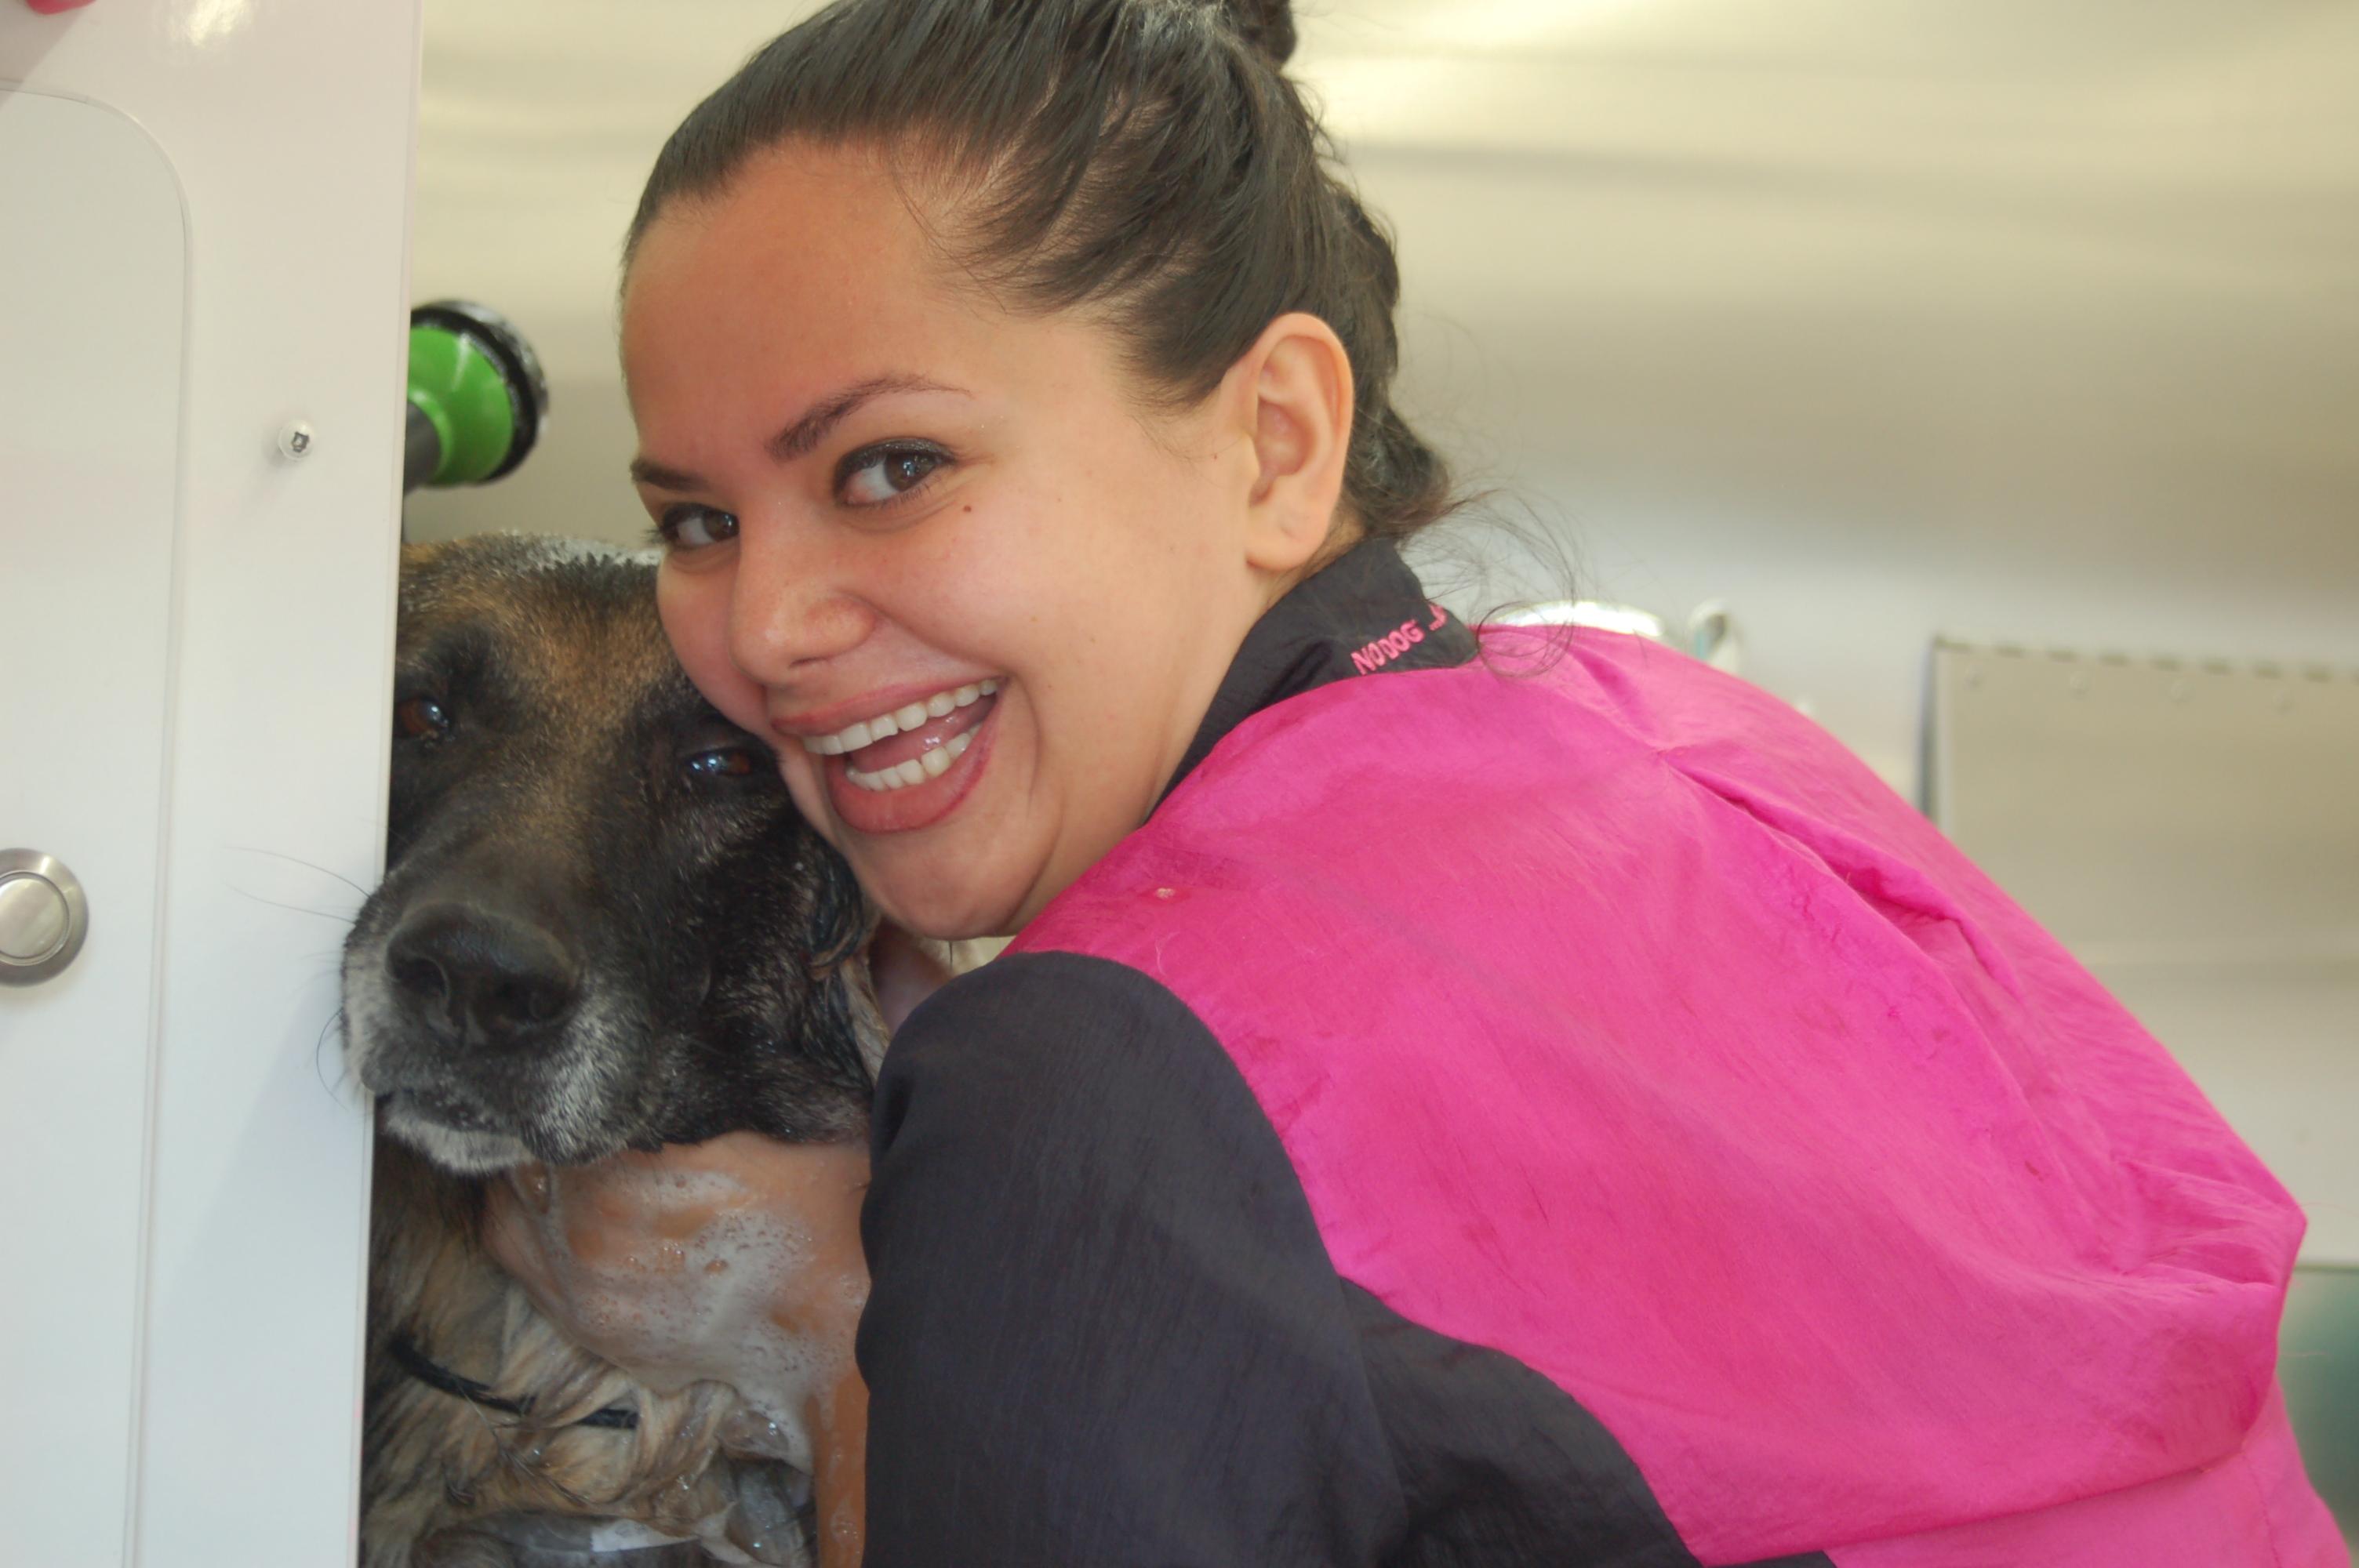 Animal Groomer Amy hugs a dog at a Grooming Station.